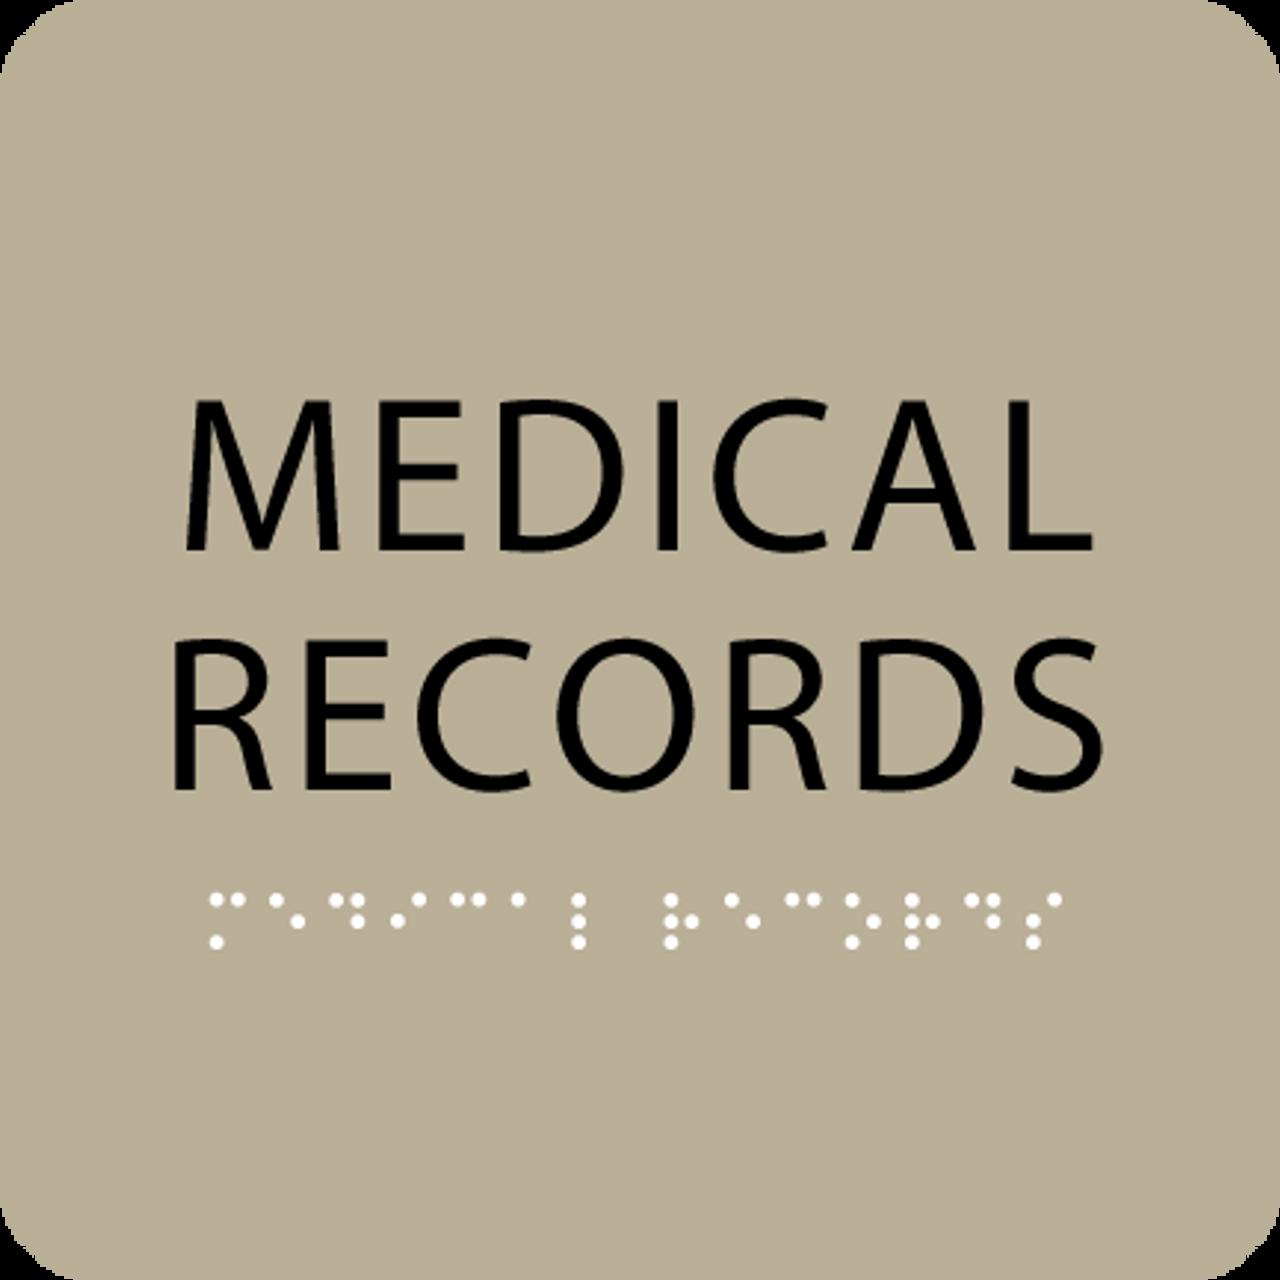 Brown Medical Records ADA Sign